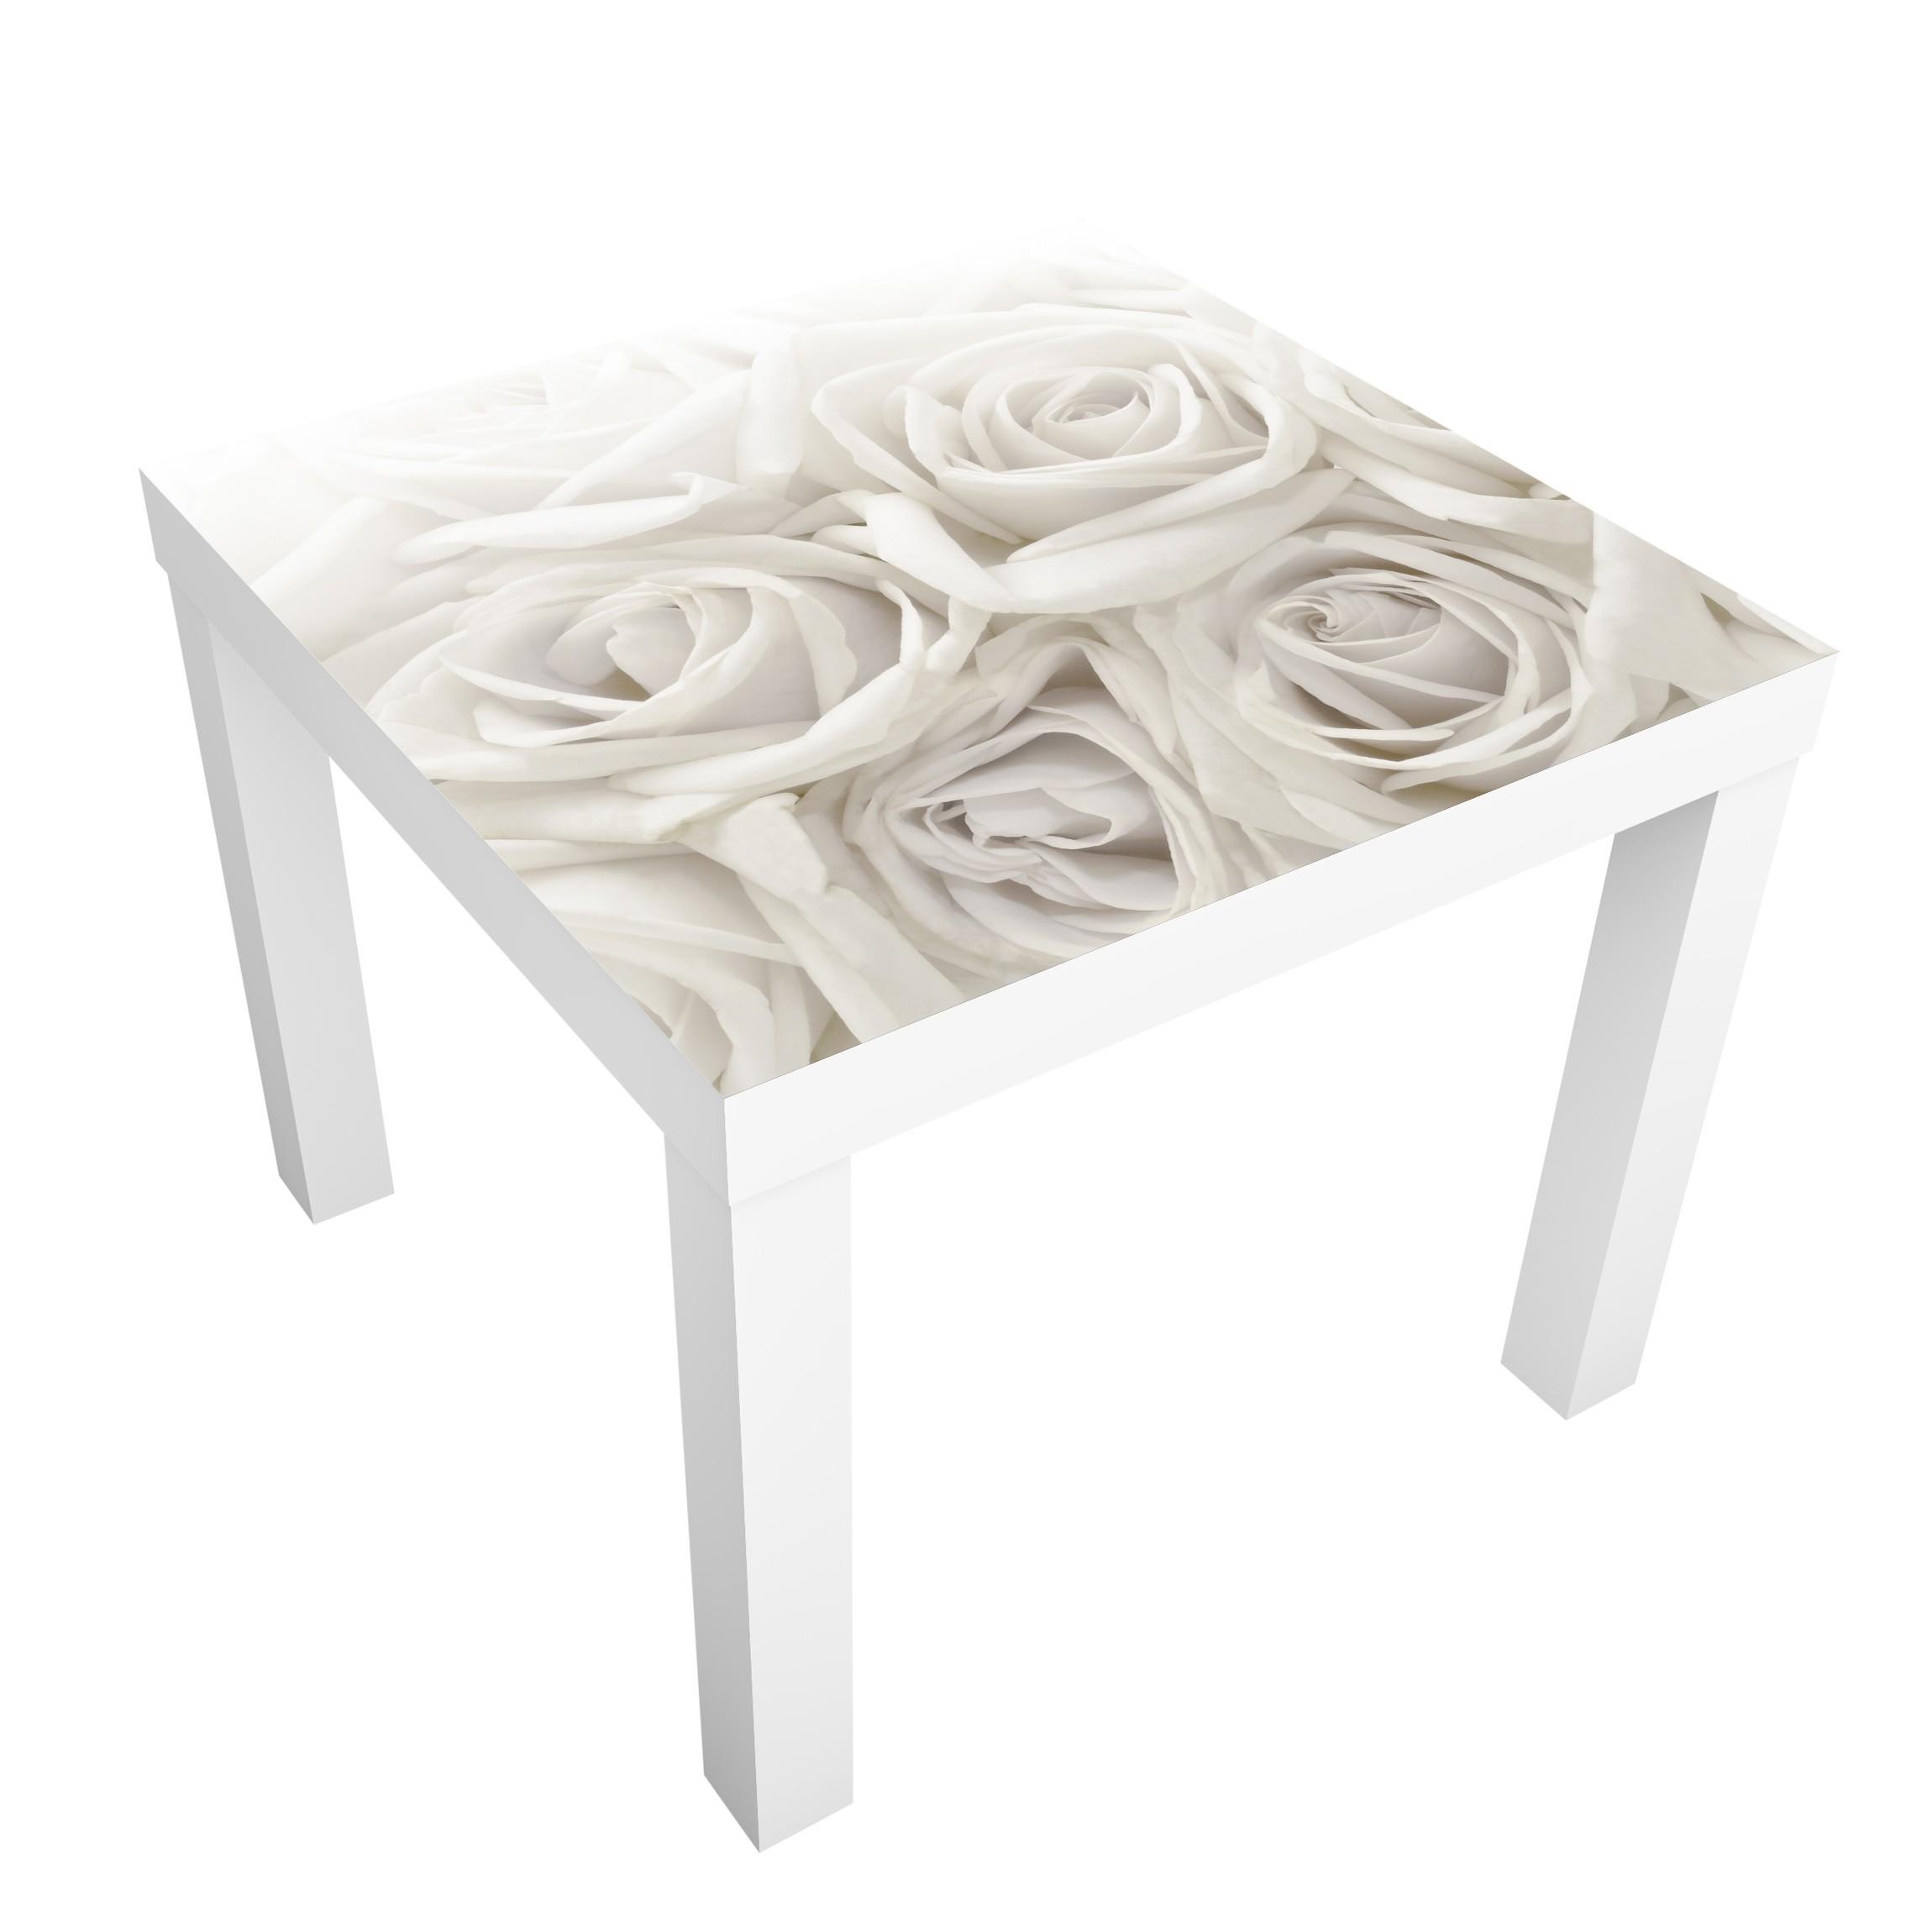 Carta Adesiva Per Mobili Ikea Lack Tavolino White Roses